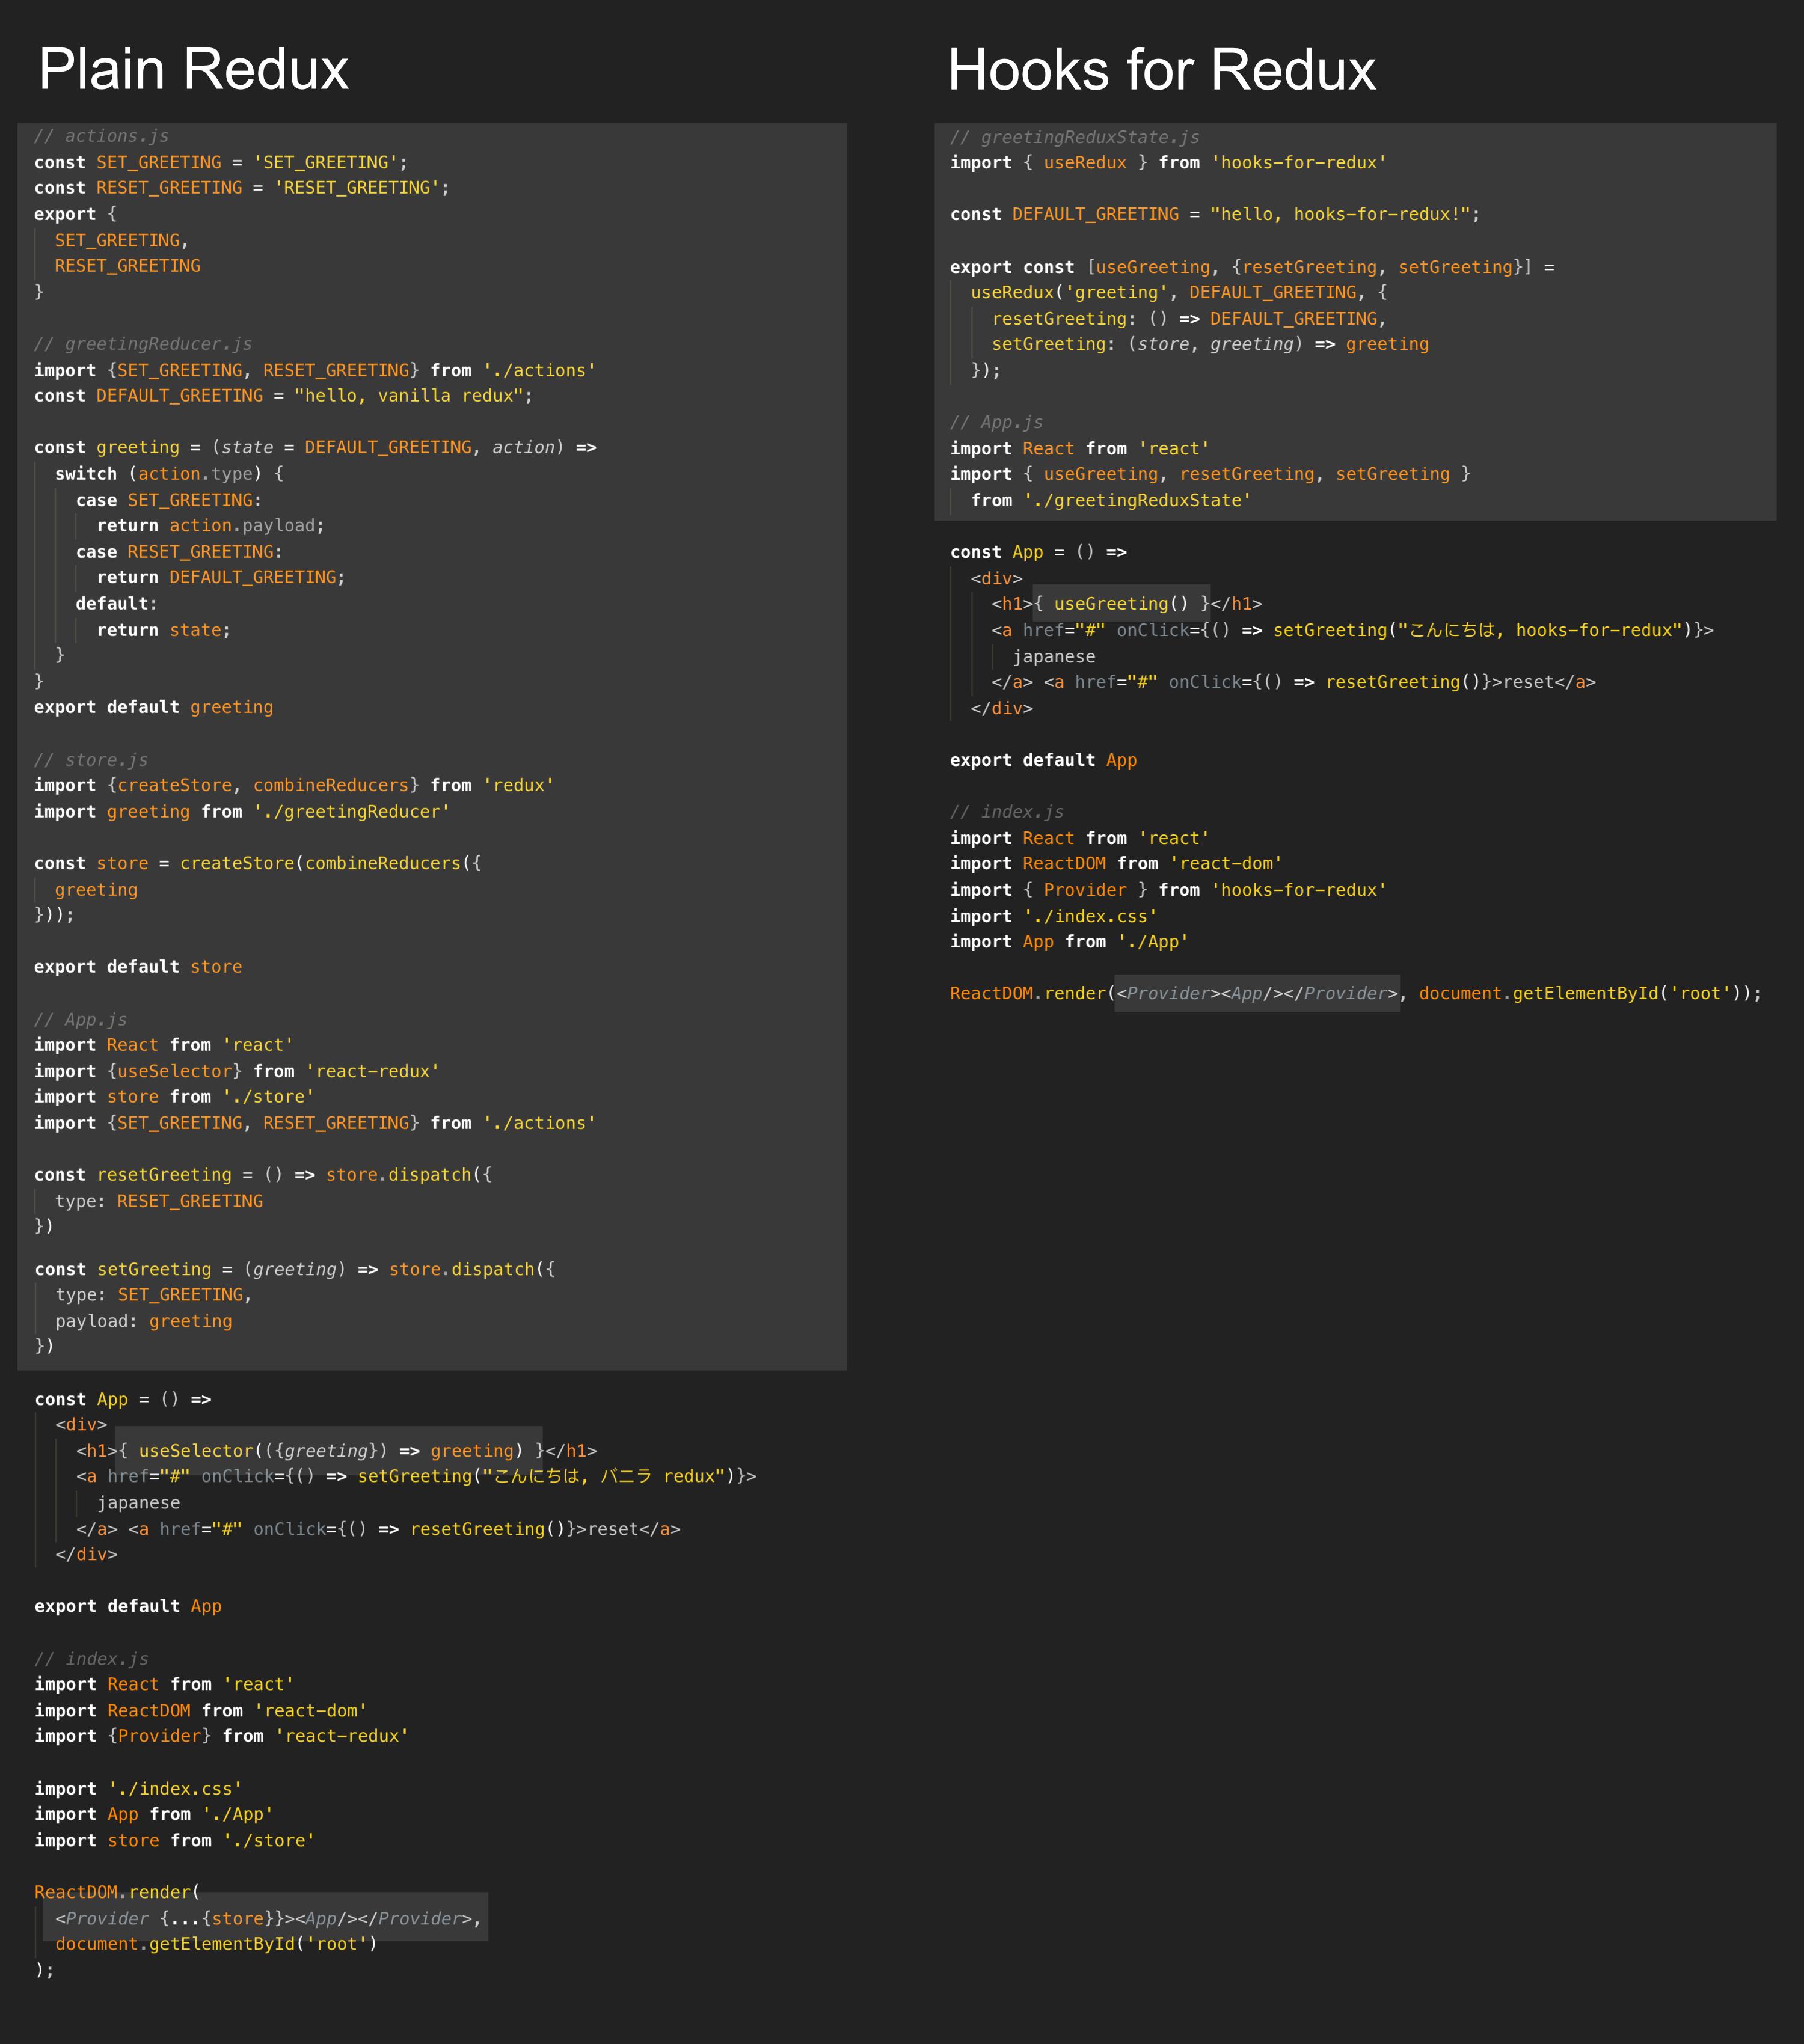 hooks-for-redux vs plain-redux comparison